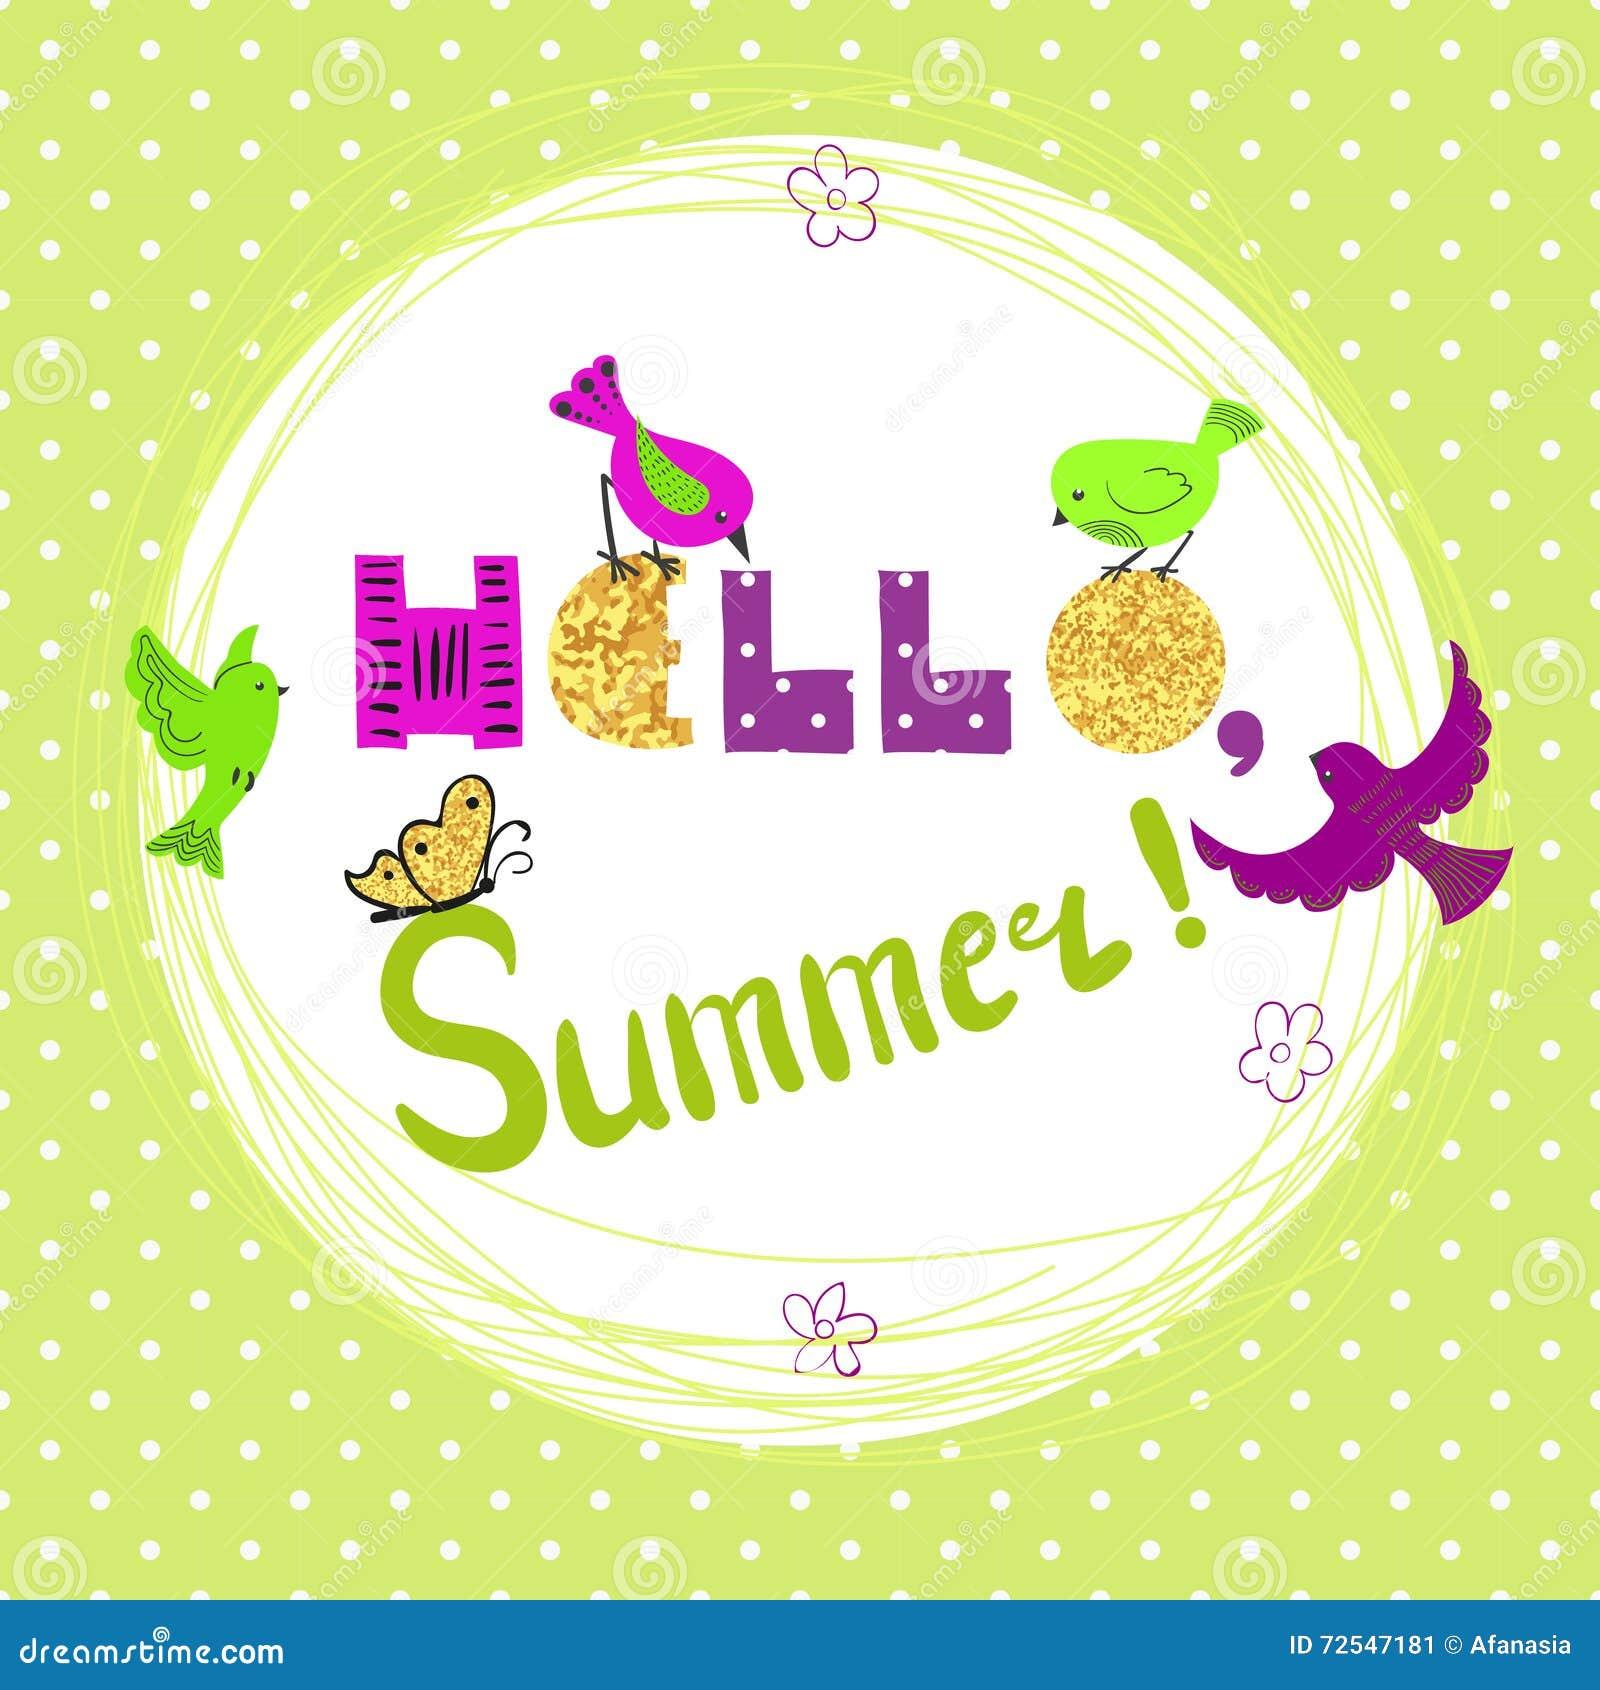 Summer Card Design With Cute Cartoon Birds. Stock Vector - Image: 72547181